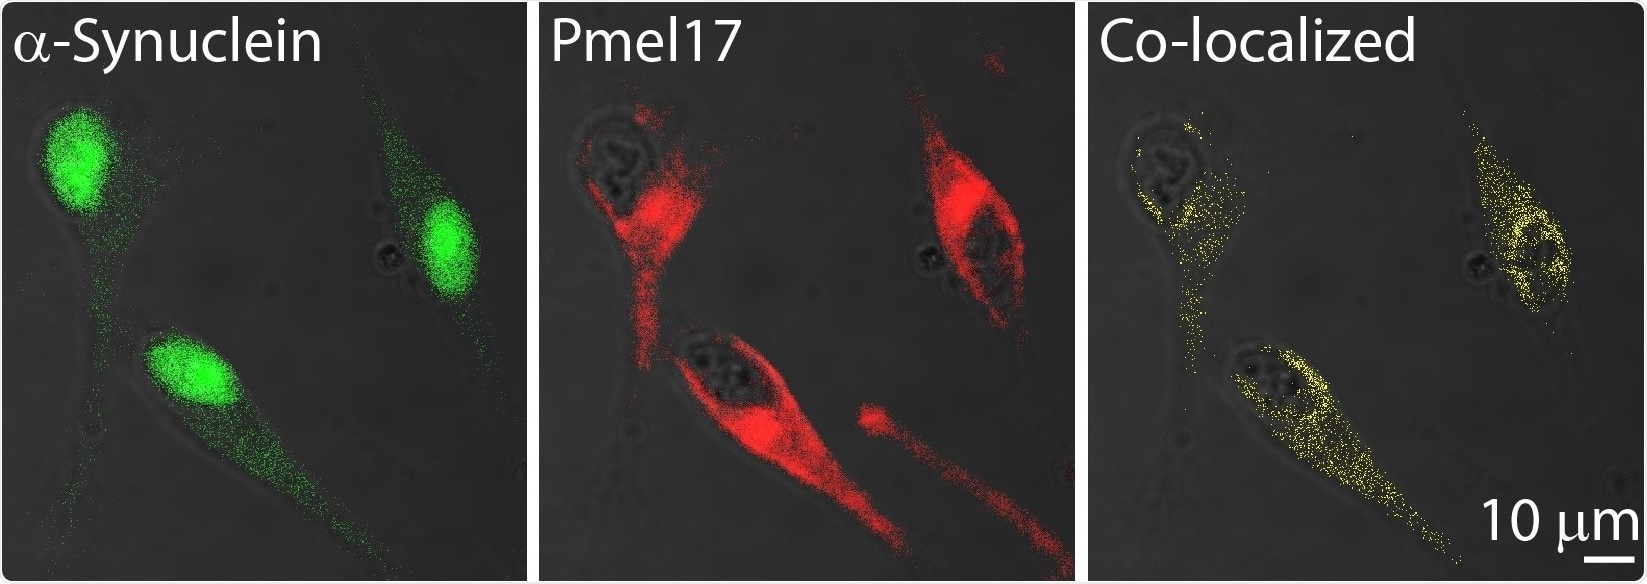 Study indicates an amyloid link between melanoma and Parkinson's disease